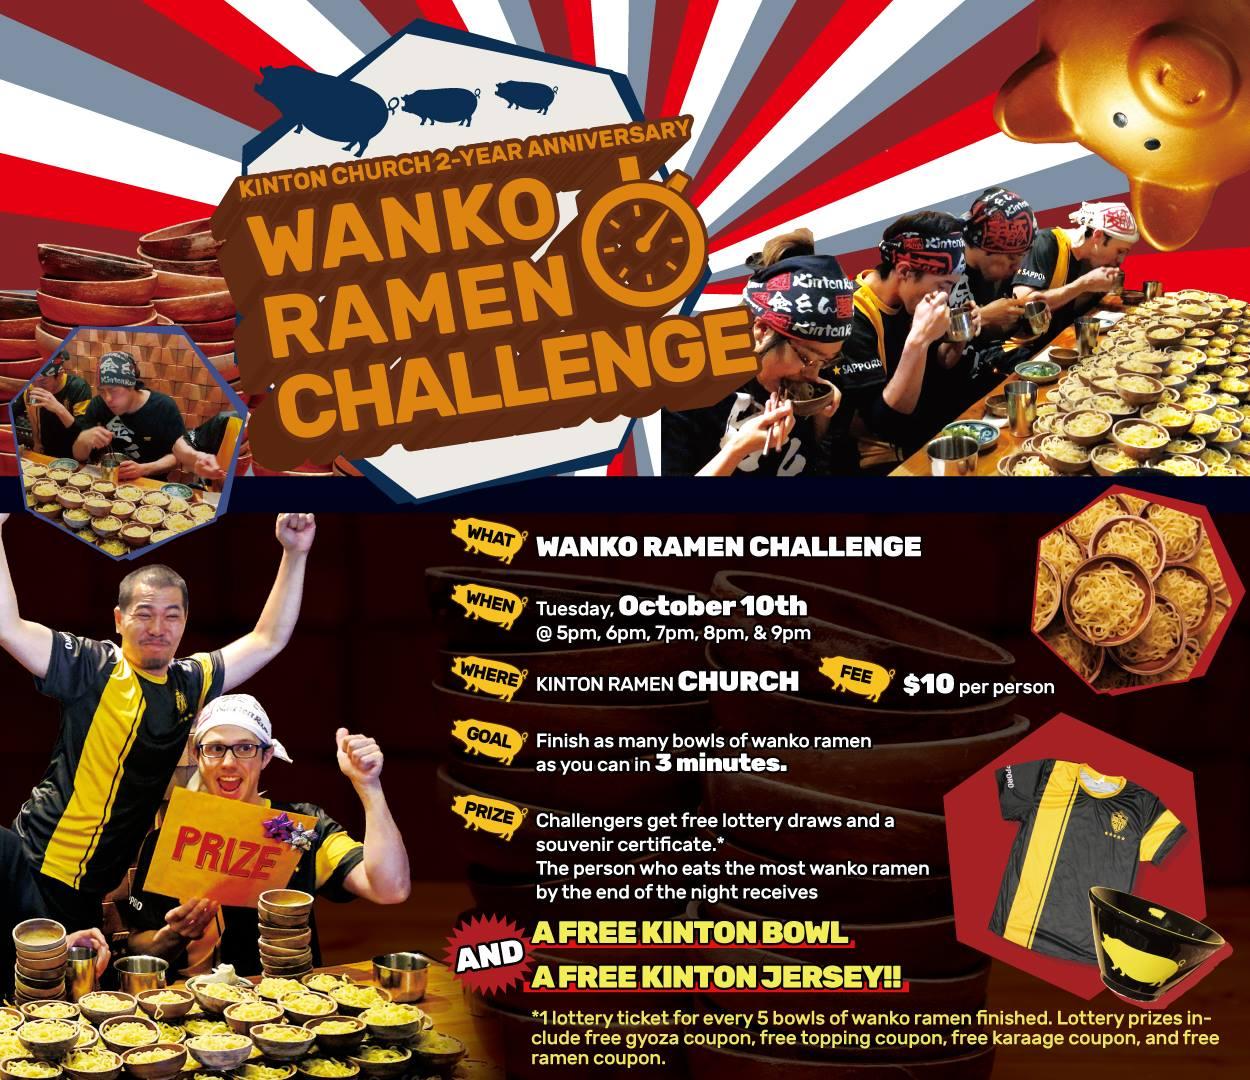 Kinton Ramen Wanko Ramen Challenge